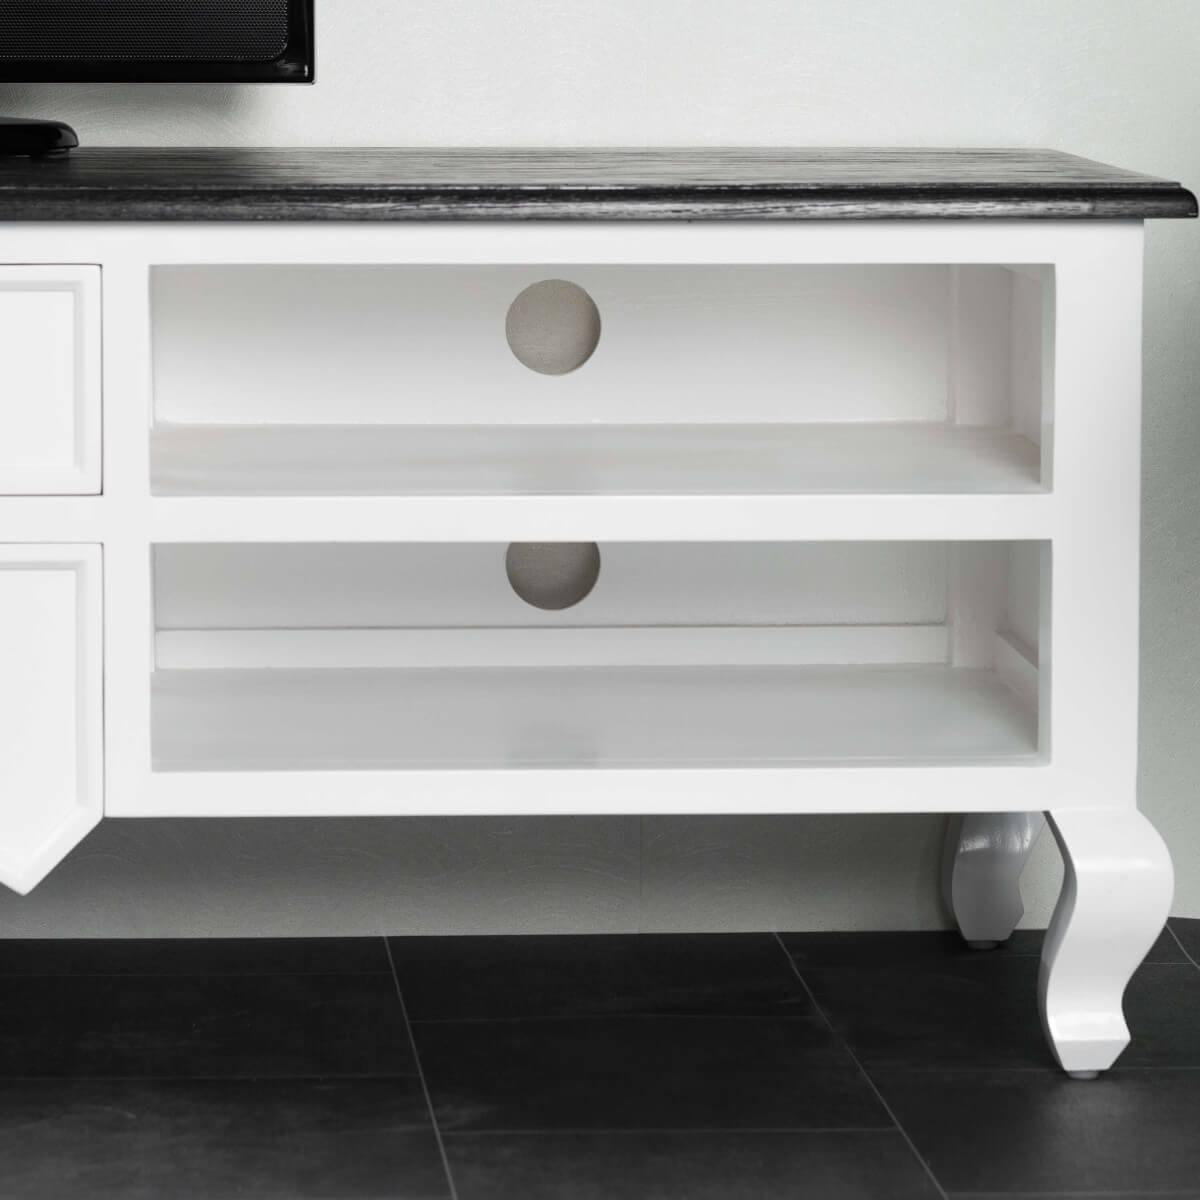 Meuble tv de salon bois acajou et pin massif idao rectangle blanc natur - Meuble acajou massif ...